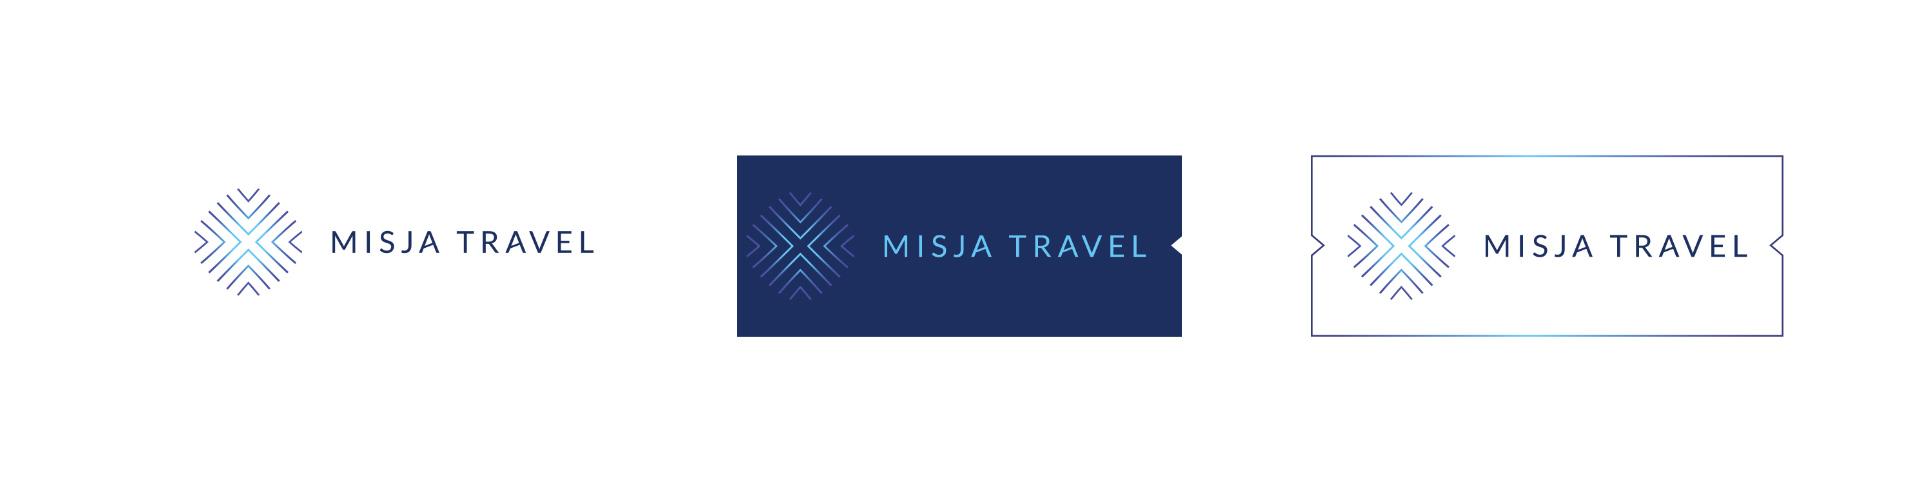 Travel agency logo options